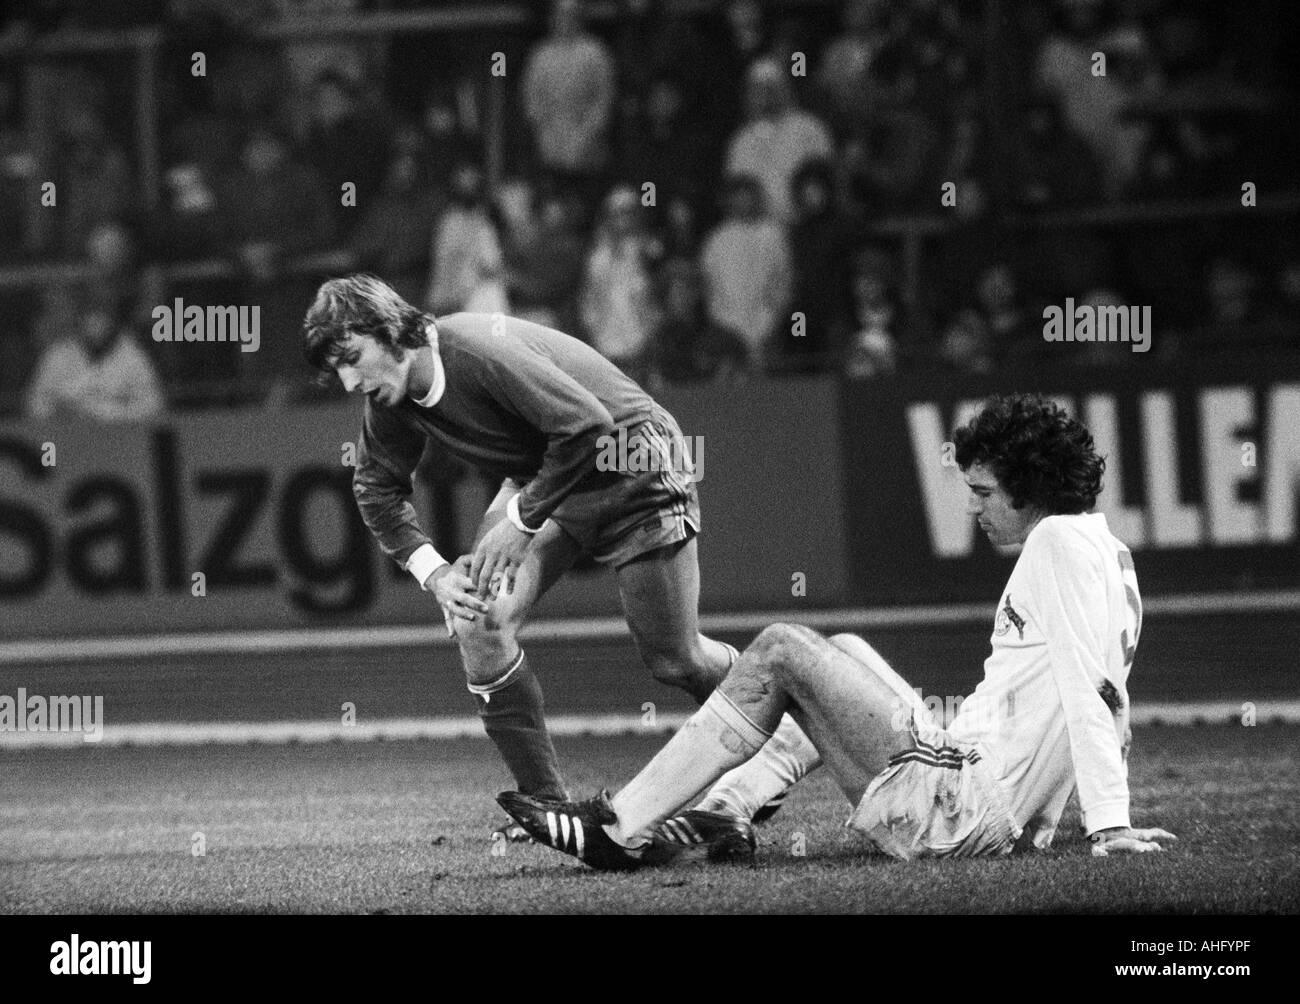 football, Bundesliga, 1973/1974, FC Schalke 04 versus 1. FC Cologne 2:2, Park Stadium in Gelsenkirchen, scene of the match, Klaus Fischer (S04) left and Bernhard Cullmann (Koeln) - Stock Image